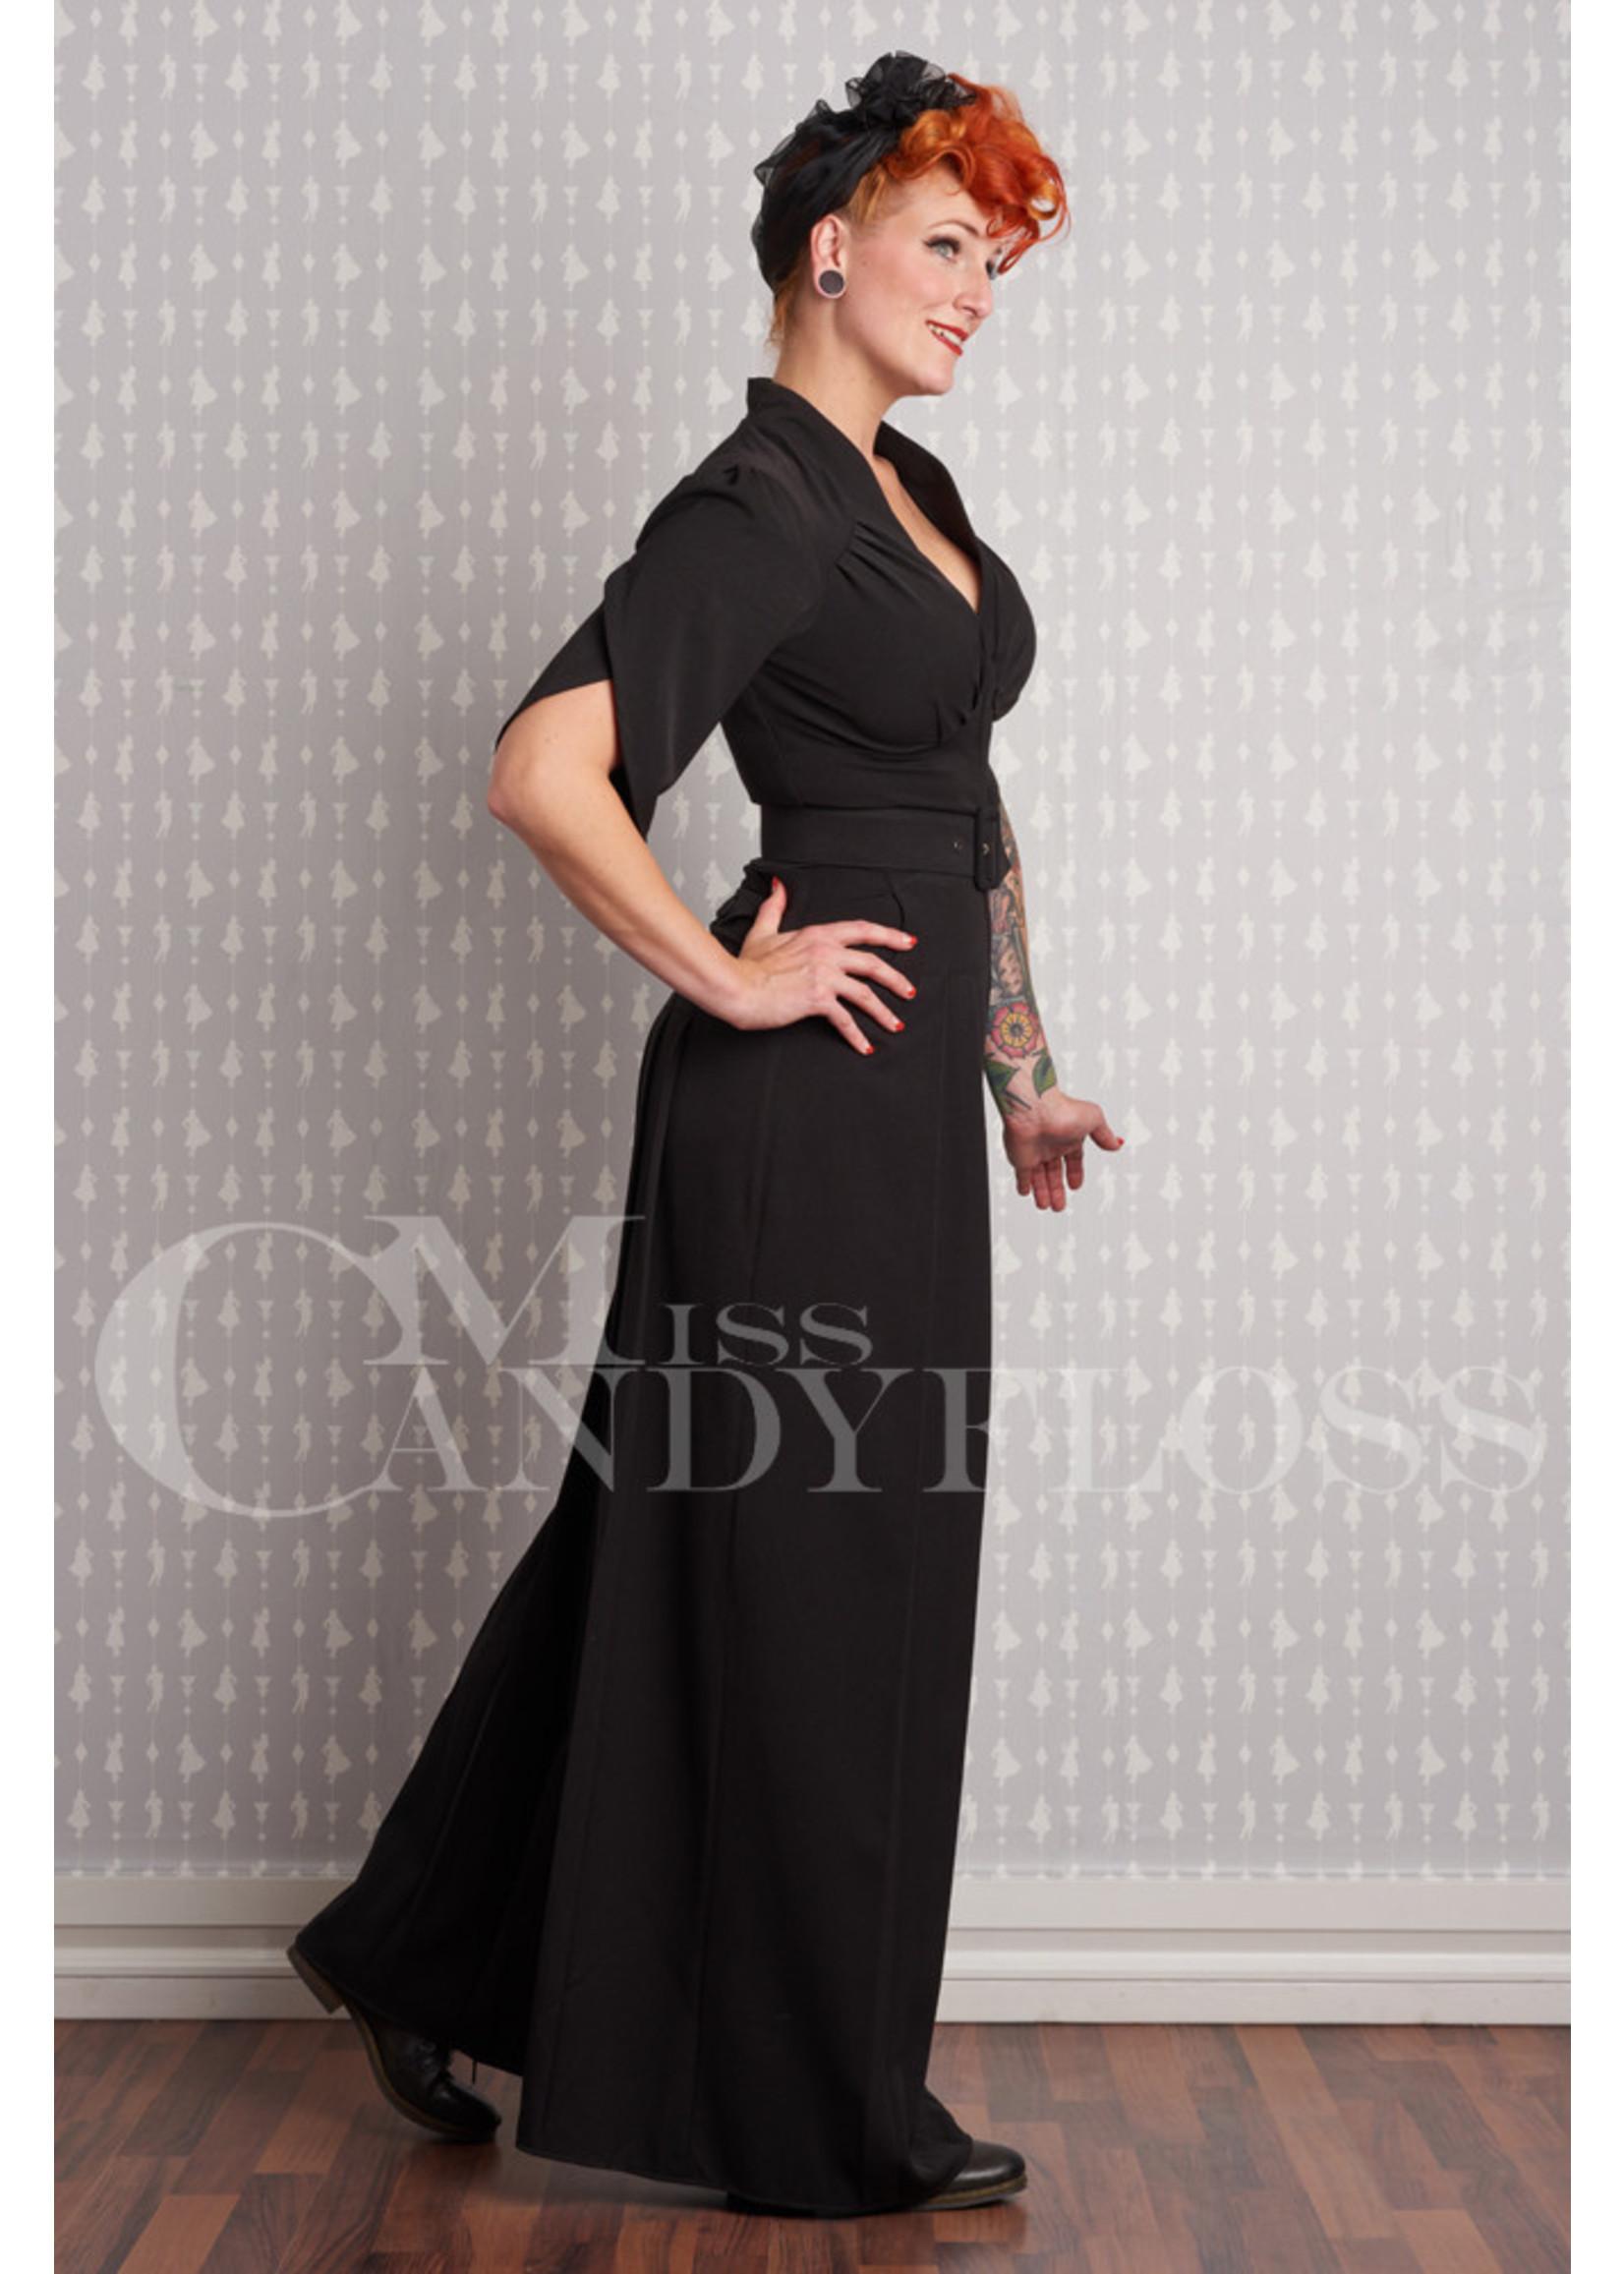 Miss-Candyfloss Miss Candyfloss Gigi-Lou Pantskirt Jumpsuit in Black